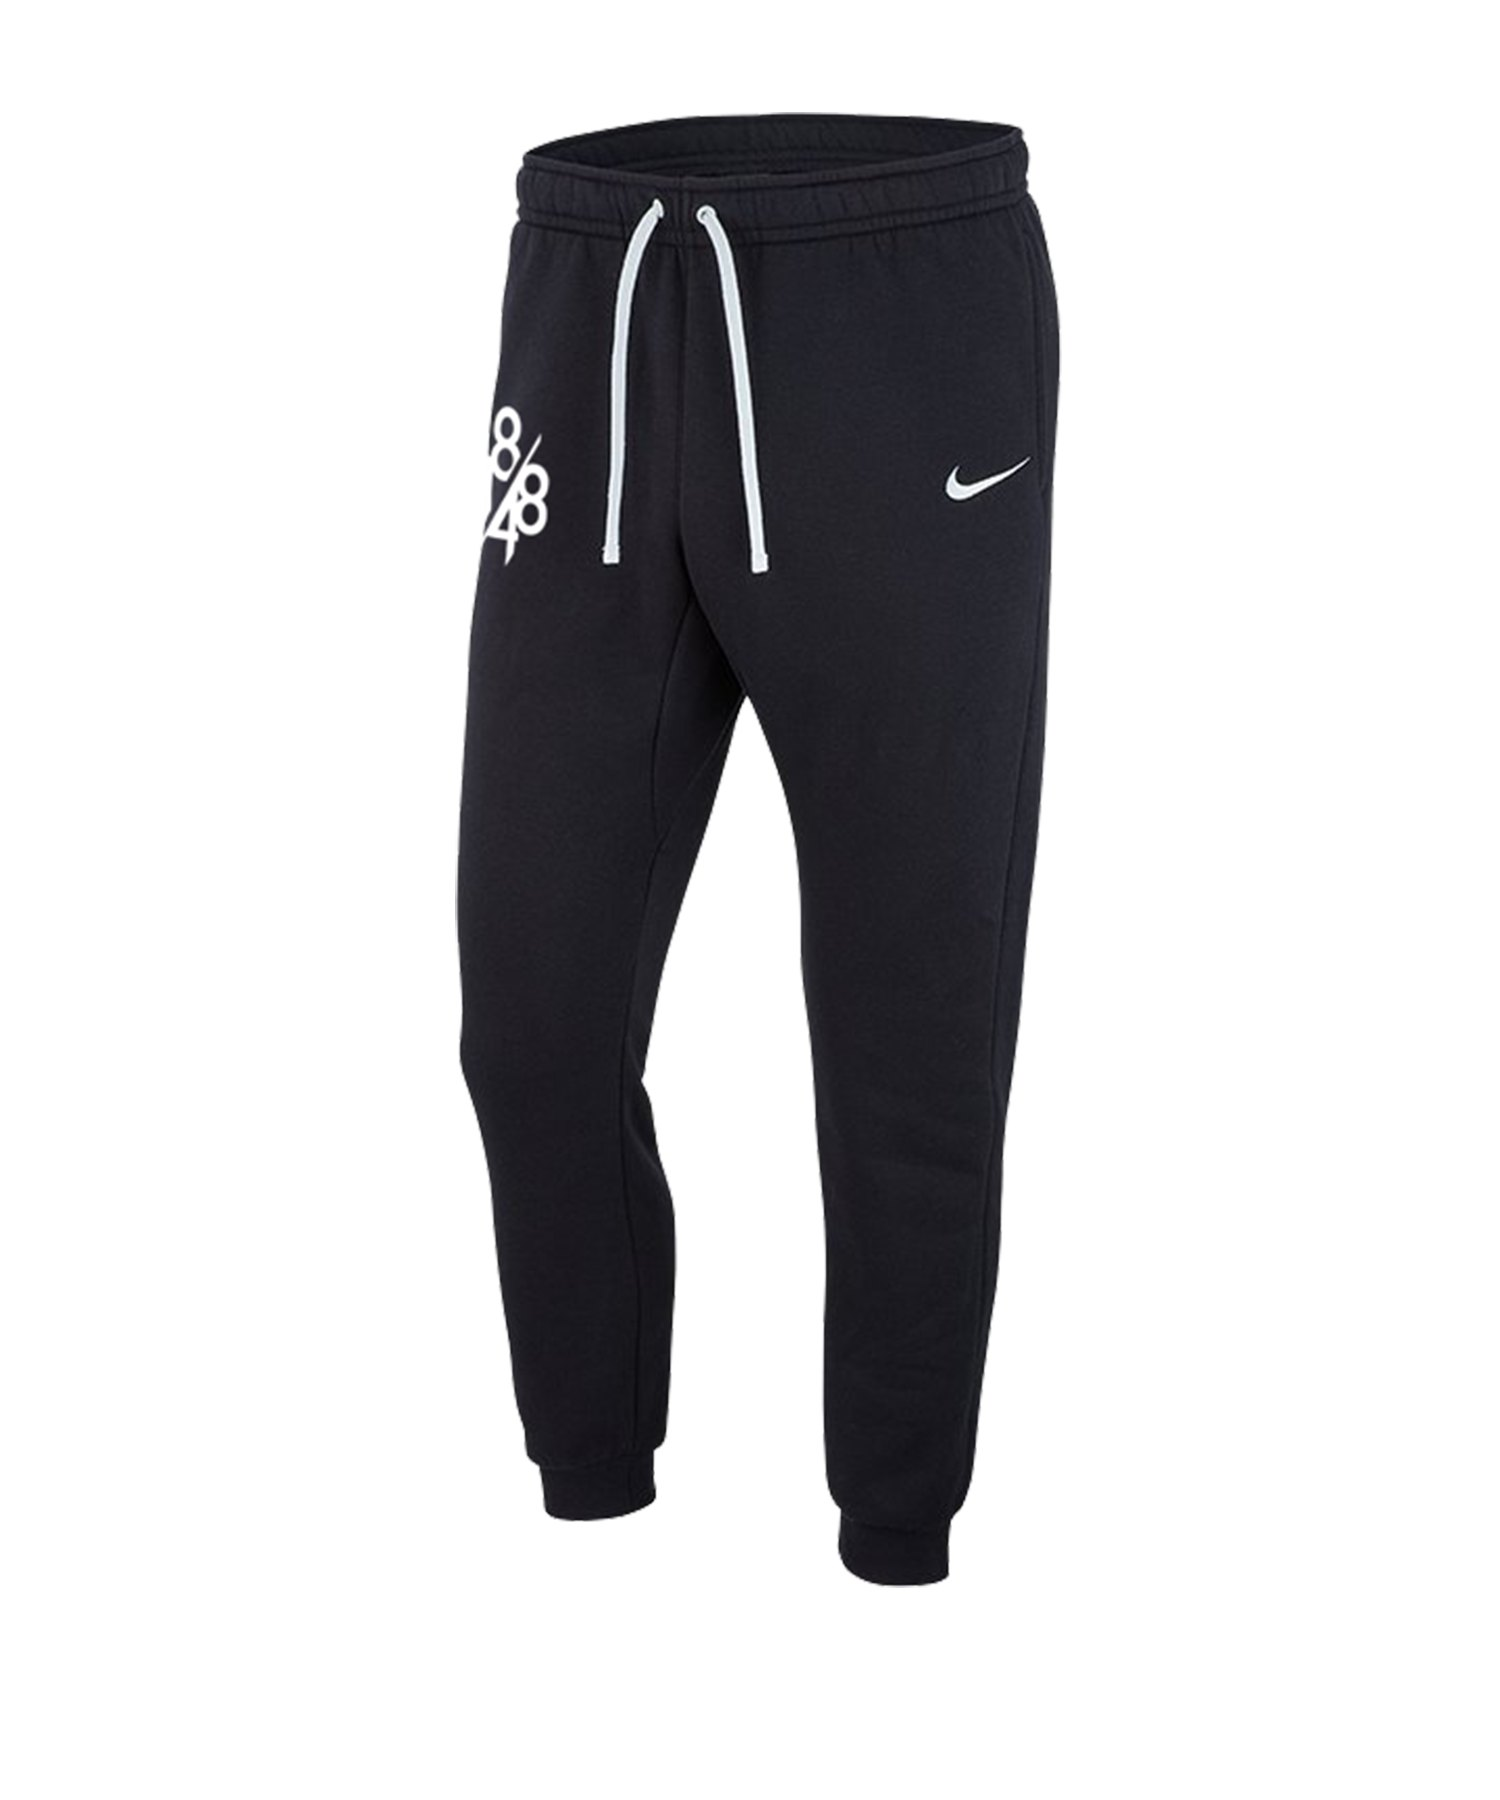 Nike VfL Bochum Jogginghose Schwarz F010 - schwarz